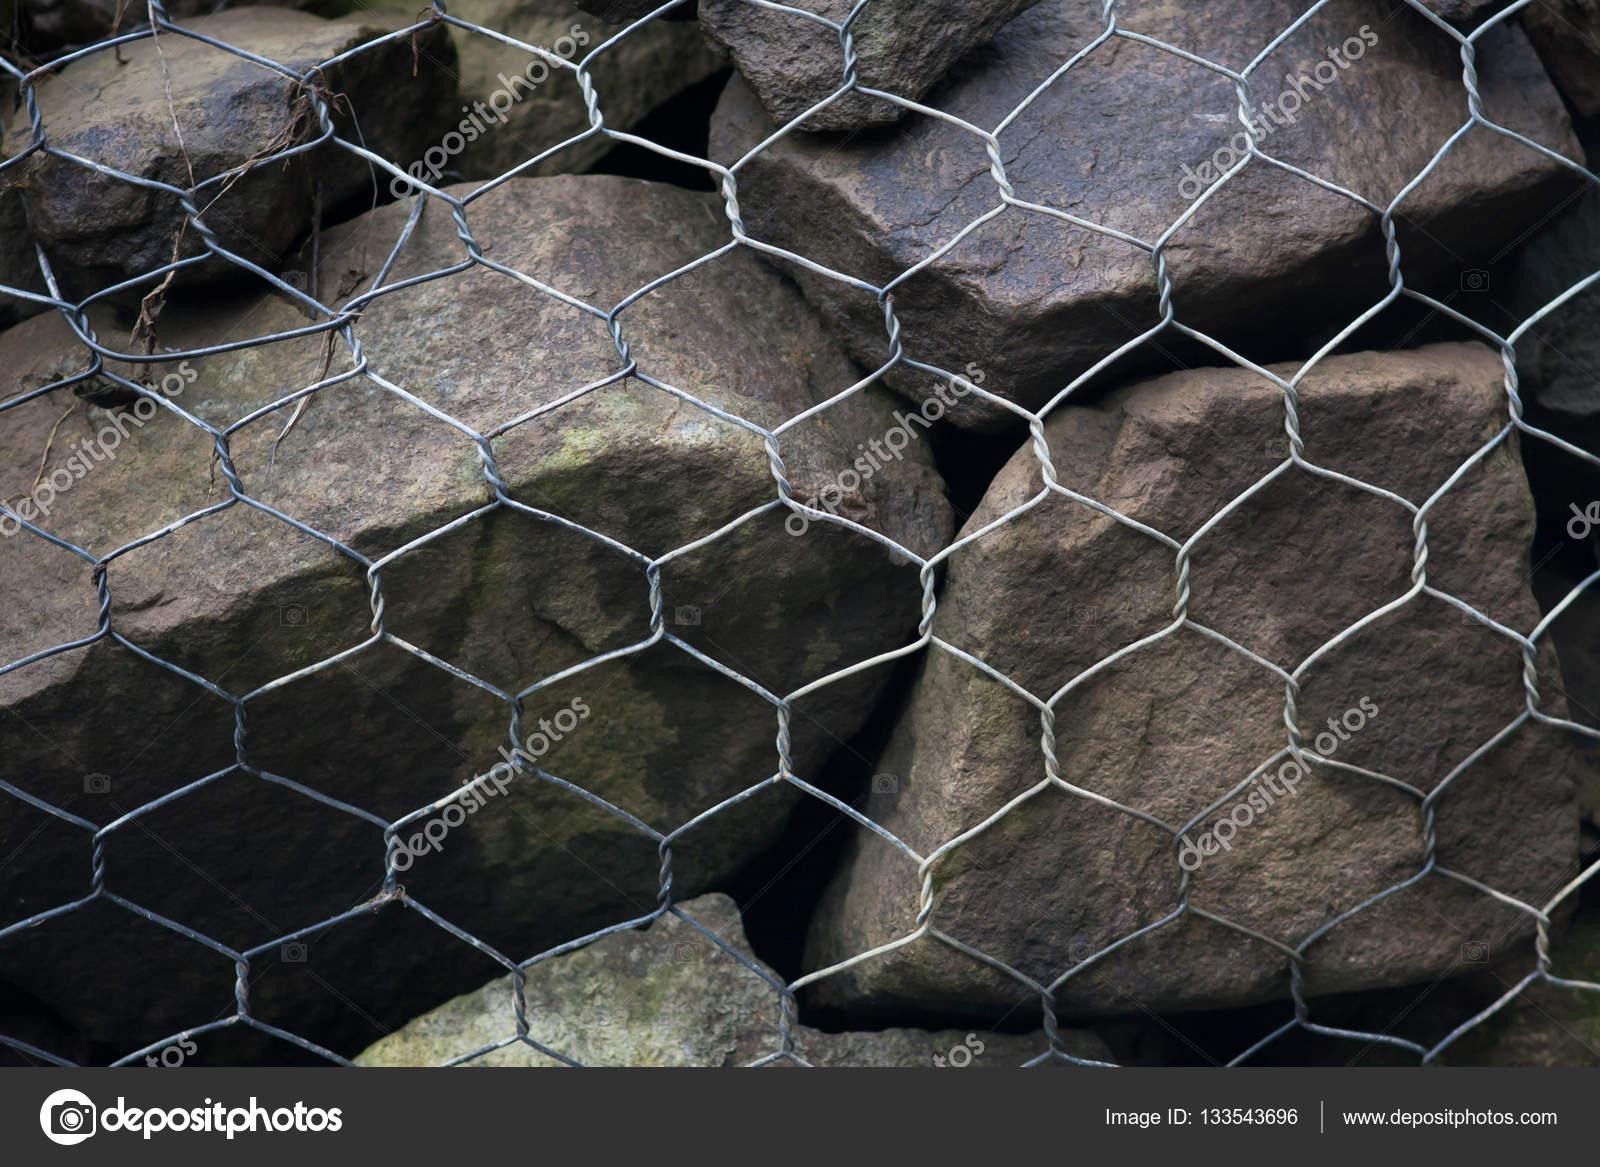 mur de gabions de treillis en acier avec pierres. Black Bedroom Furniture Sets. Home Design Ideas